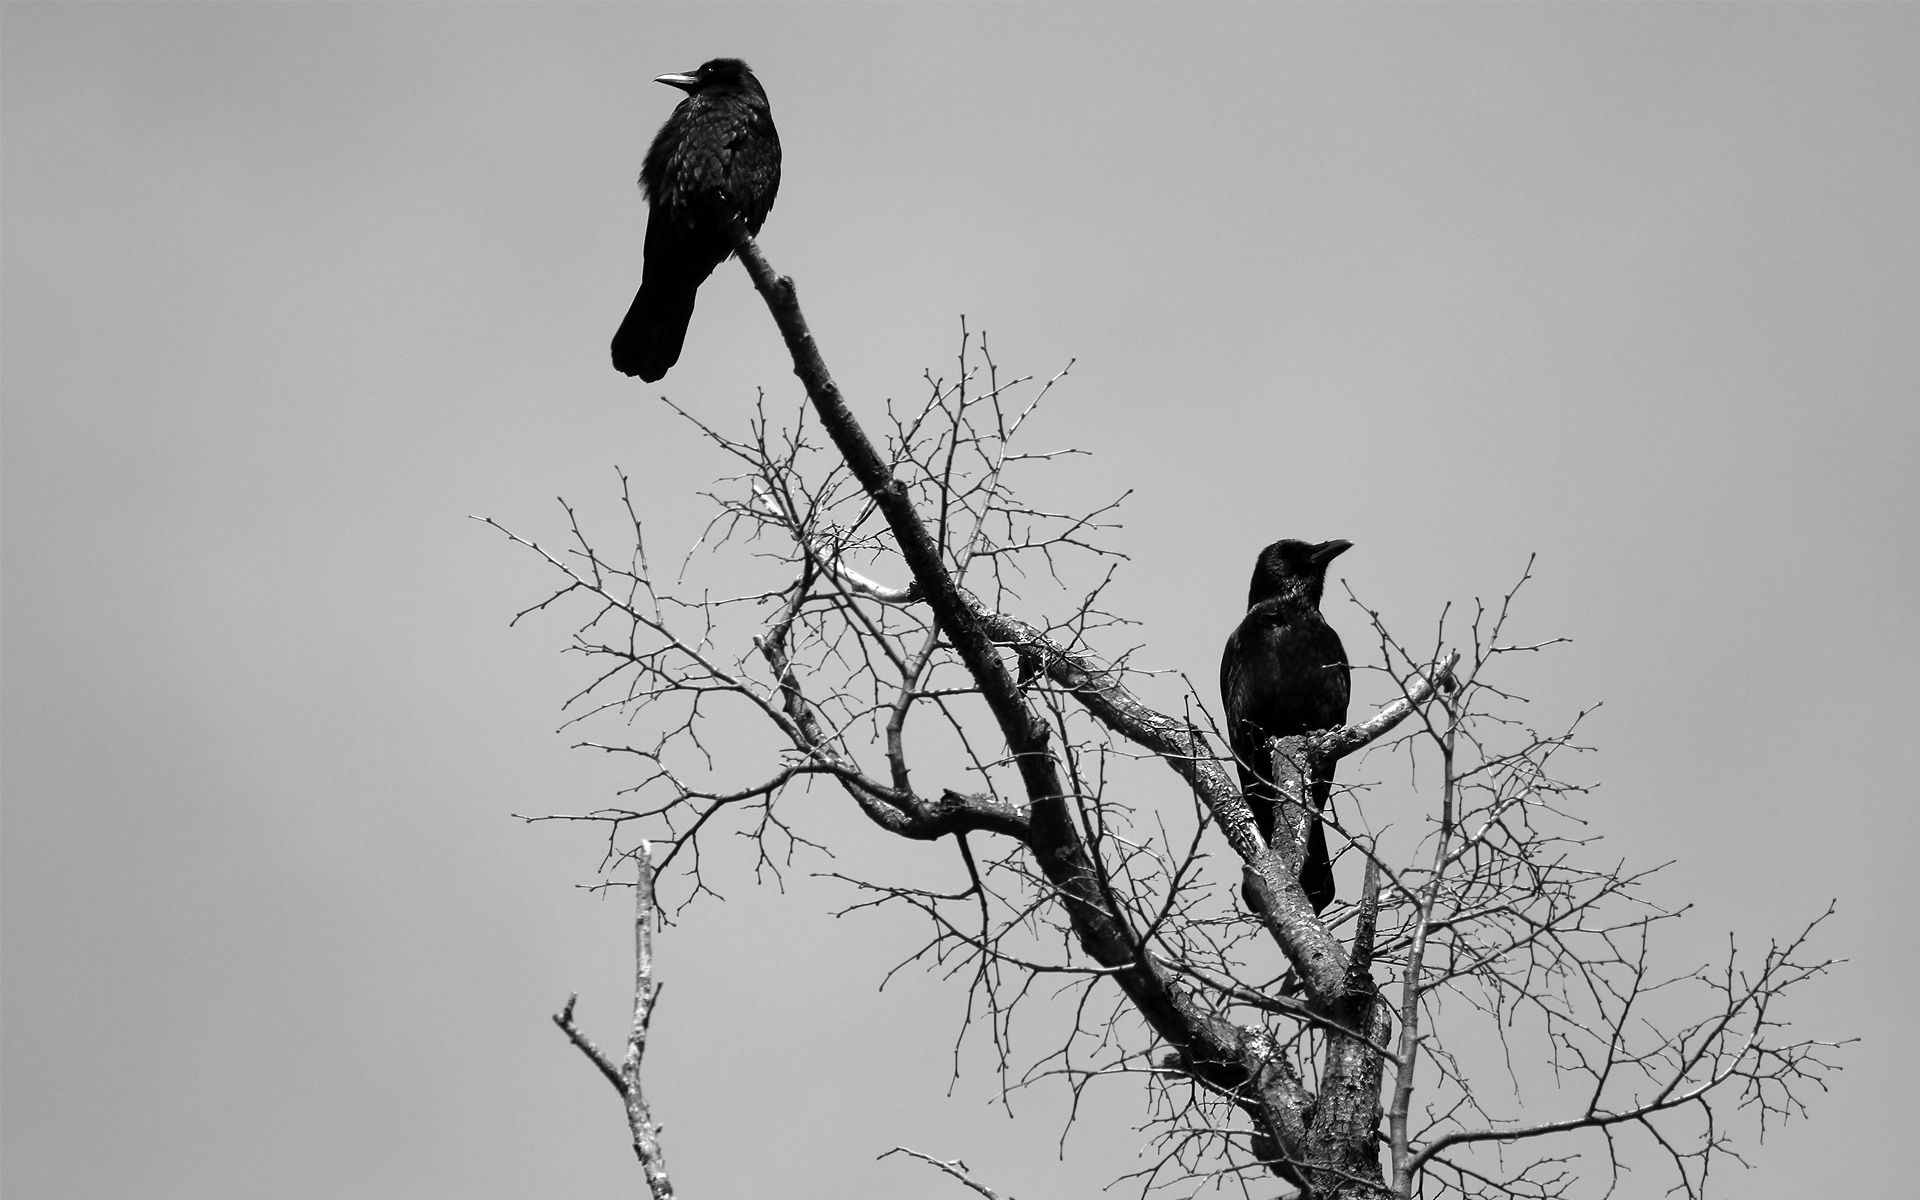 Hd Crows Wallpaper Hd Wallpapers 1080p Download Full Hd Wallpaper Download Www Free Hd Wallpaper Download Com Download Wid Crow Animal Wallpaper Black Bird